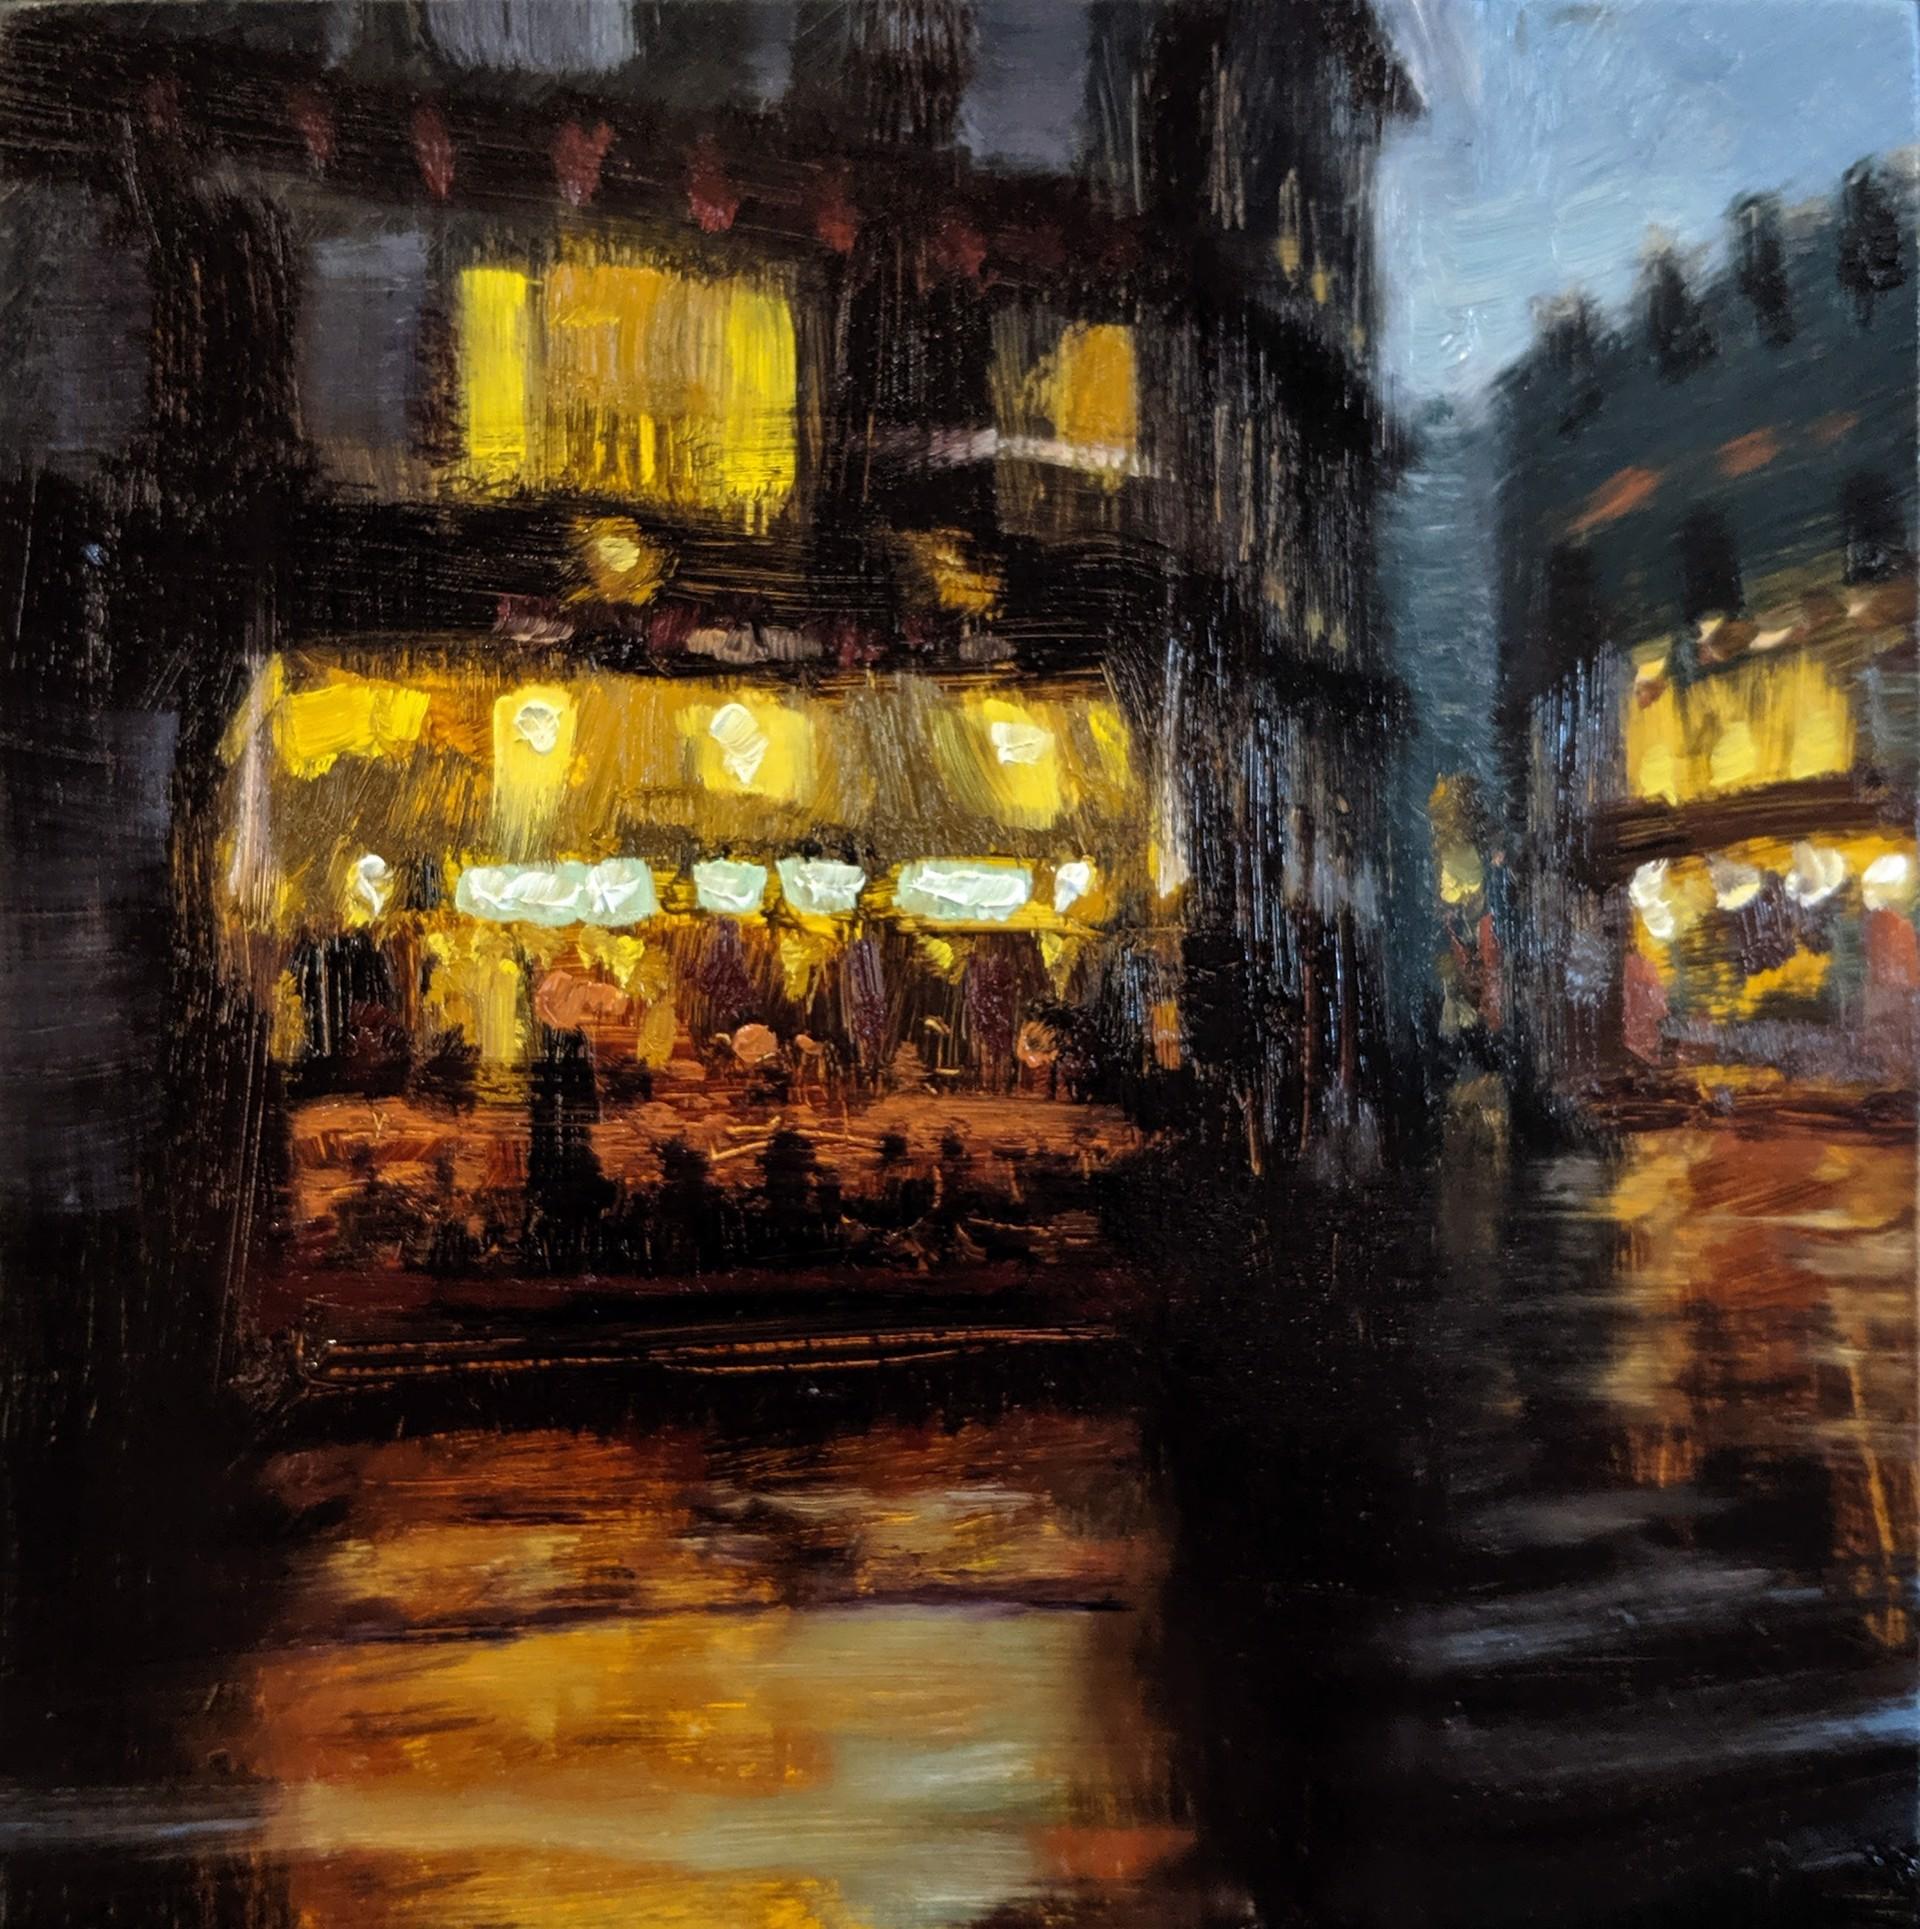 Story of Paris, Vol I, No. 1 by Christopher Clark